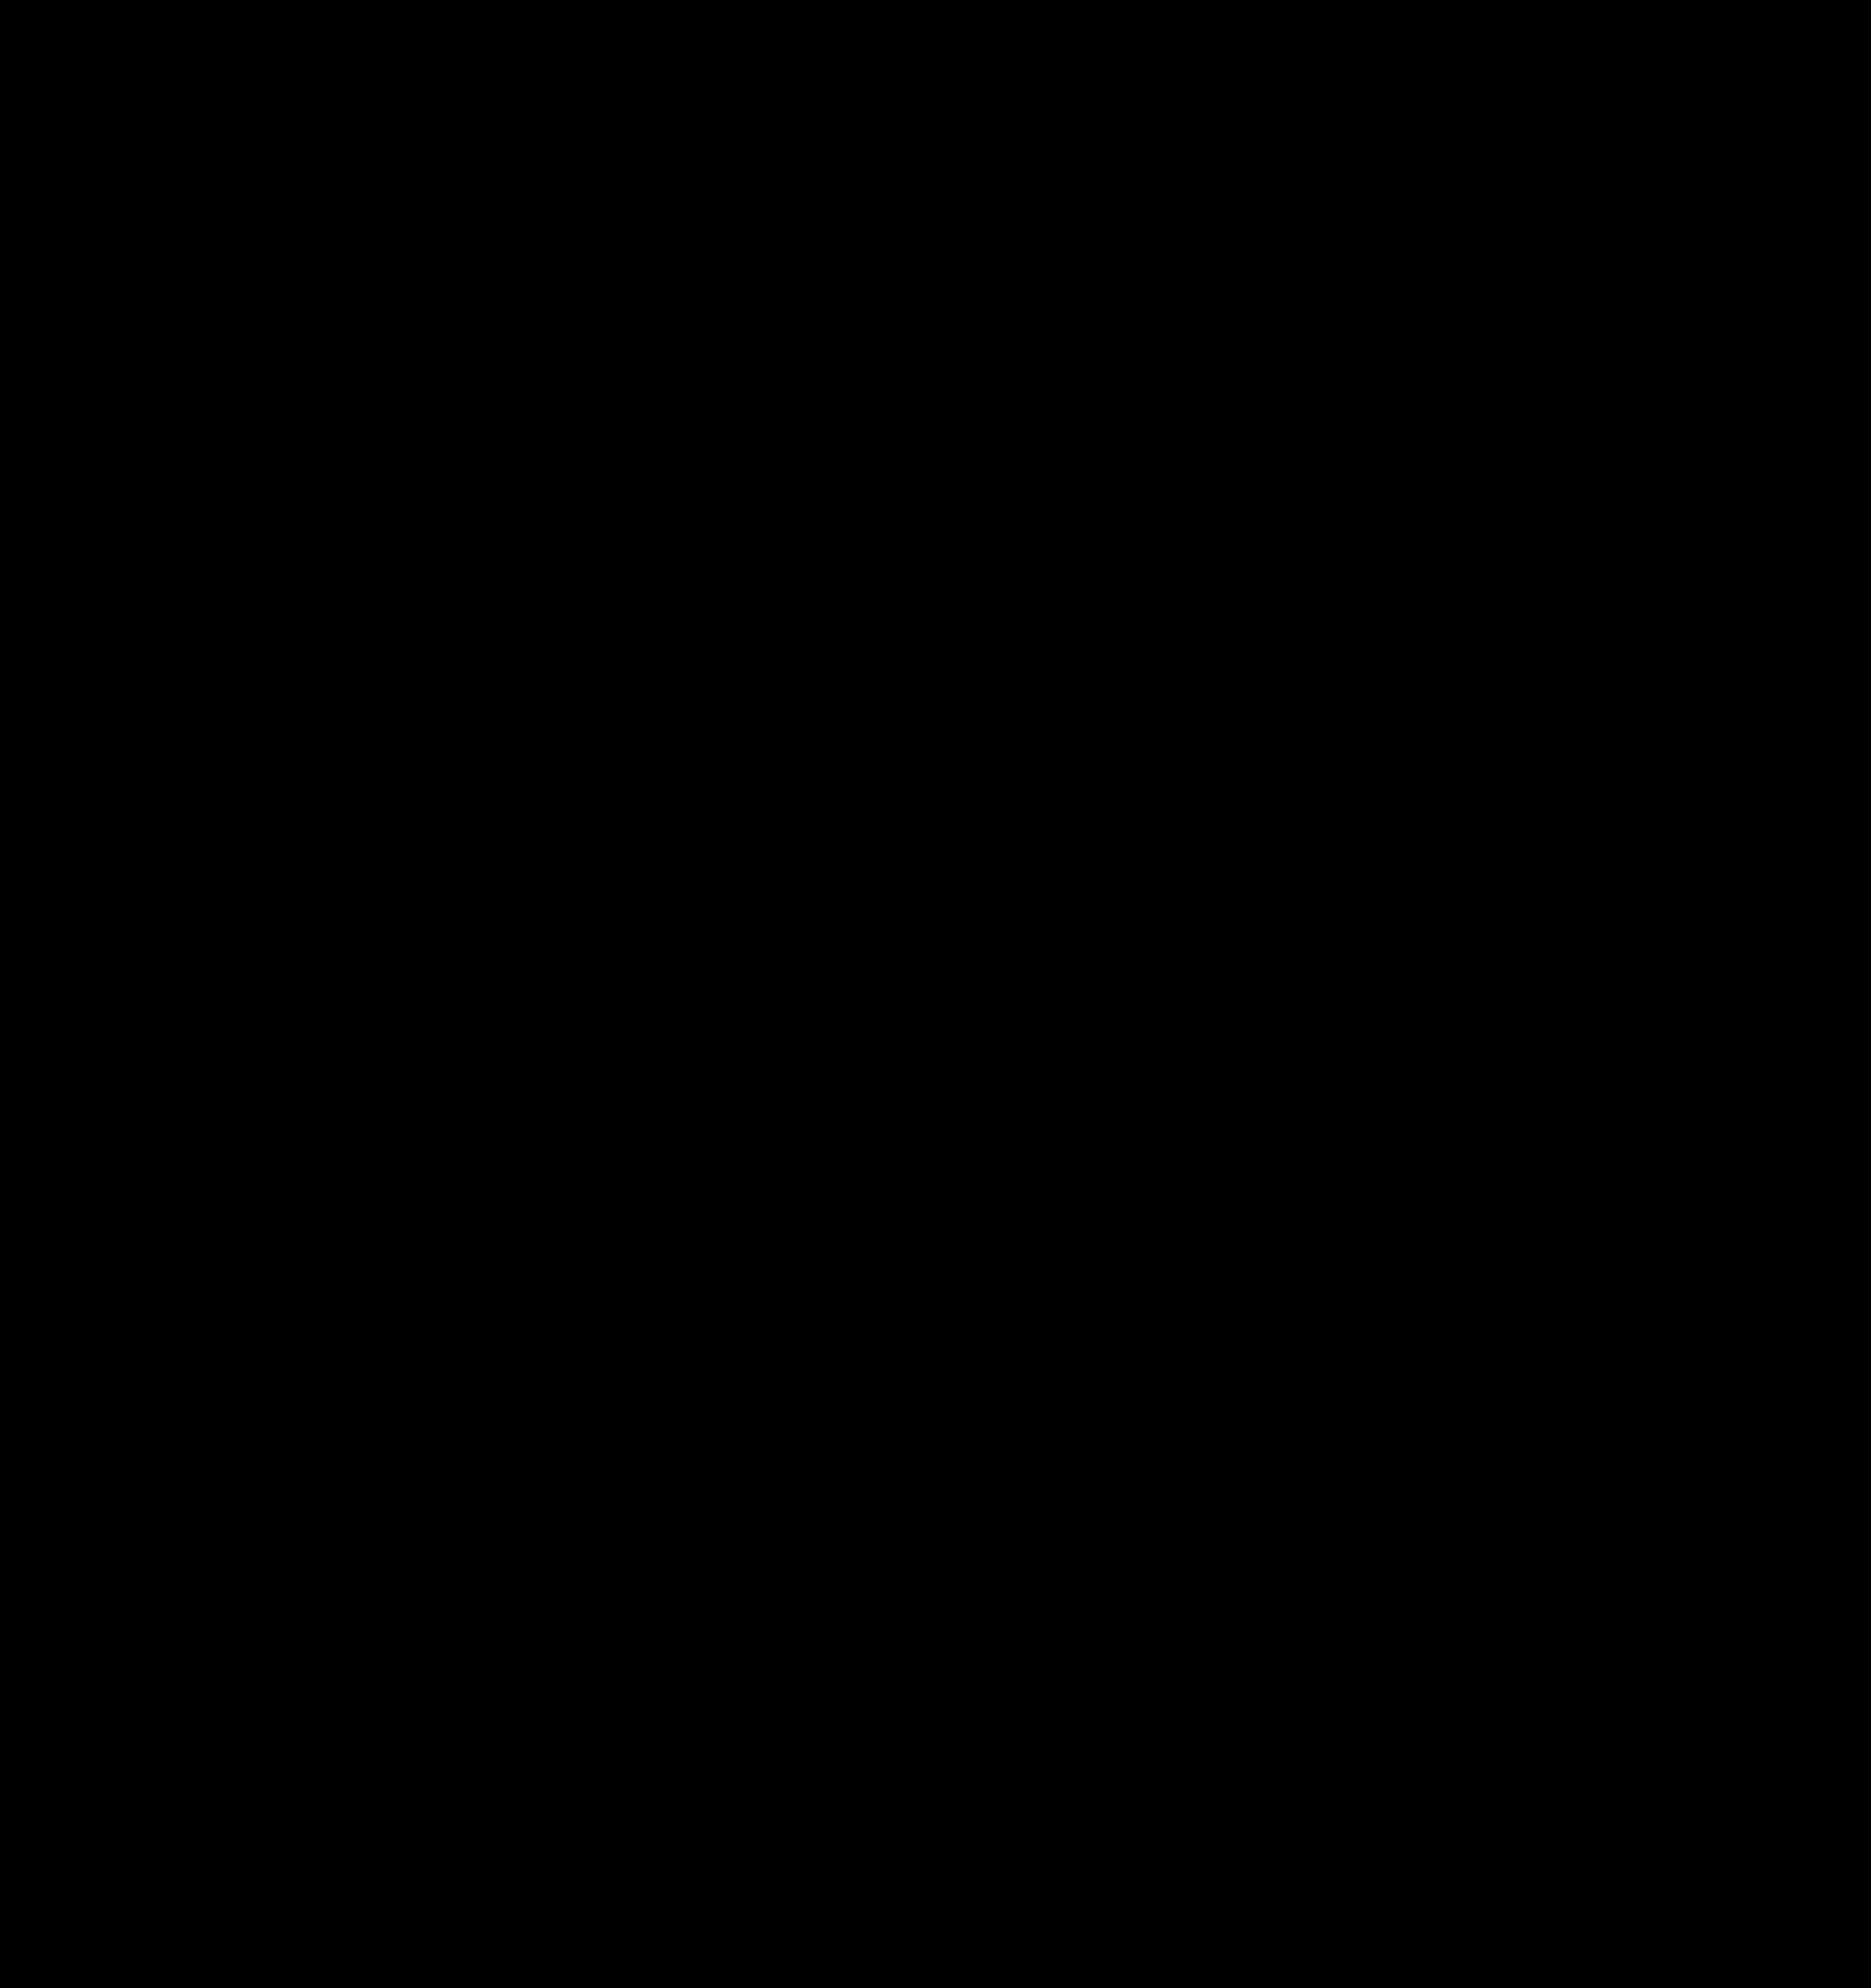 Arrow clip art silhouette. Clipart martin s cupid